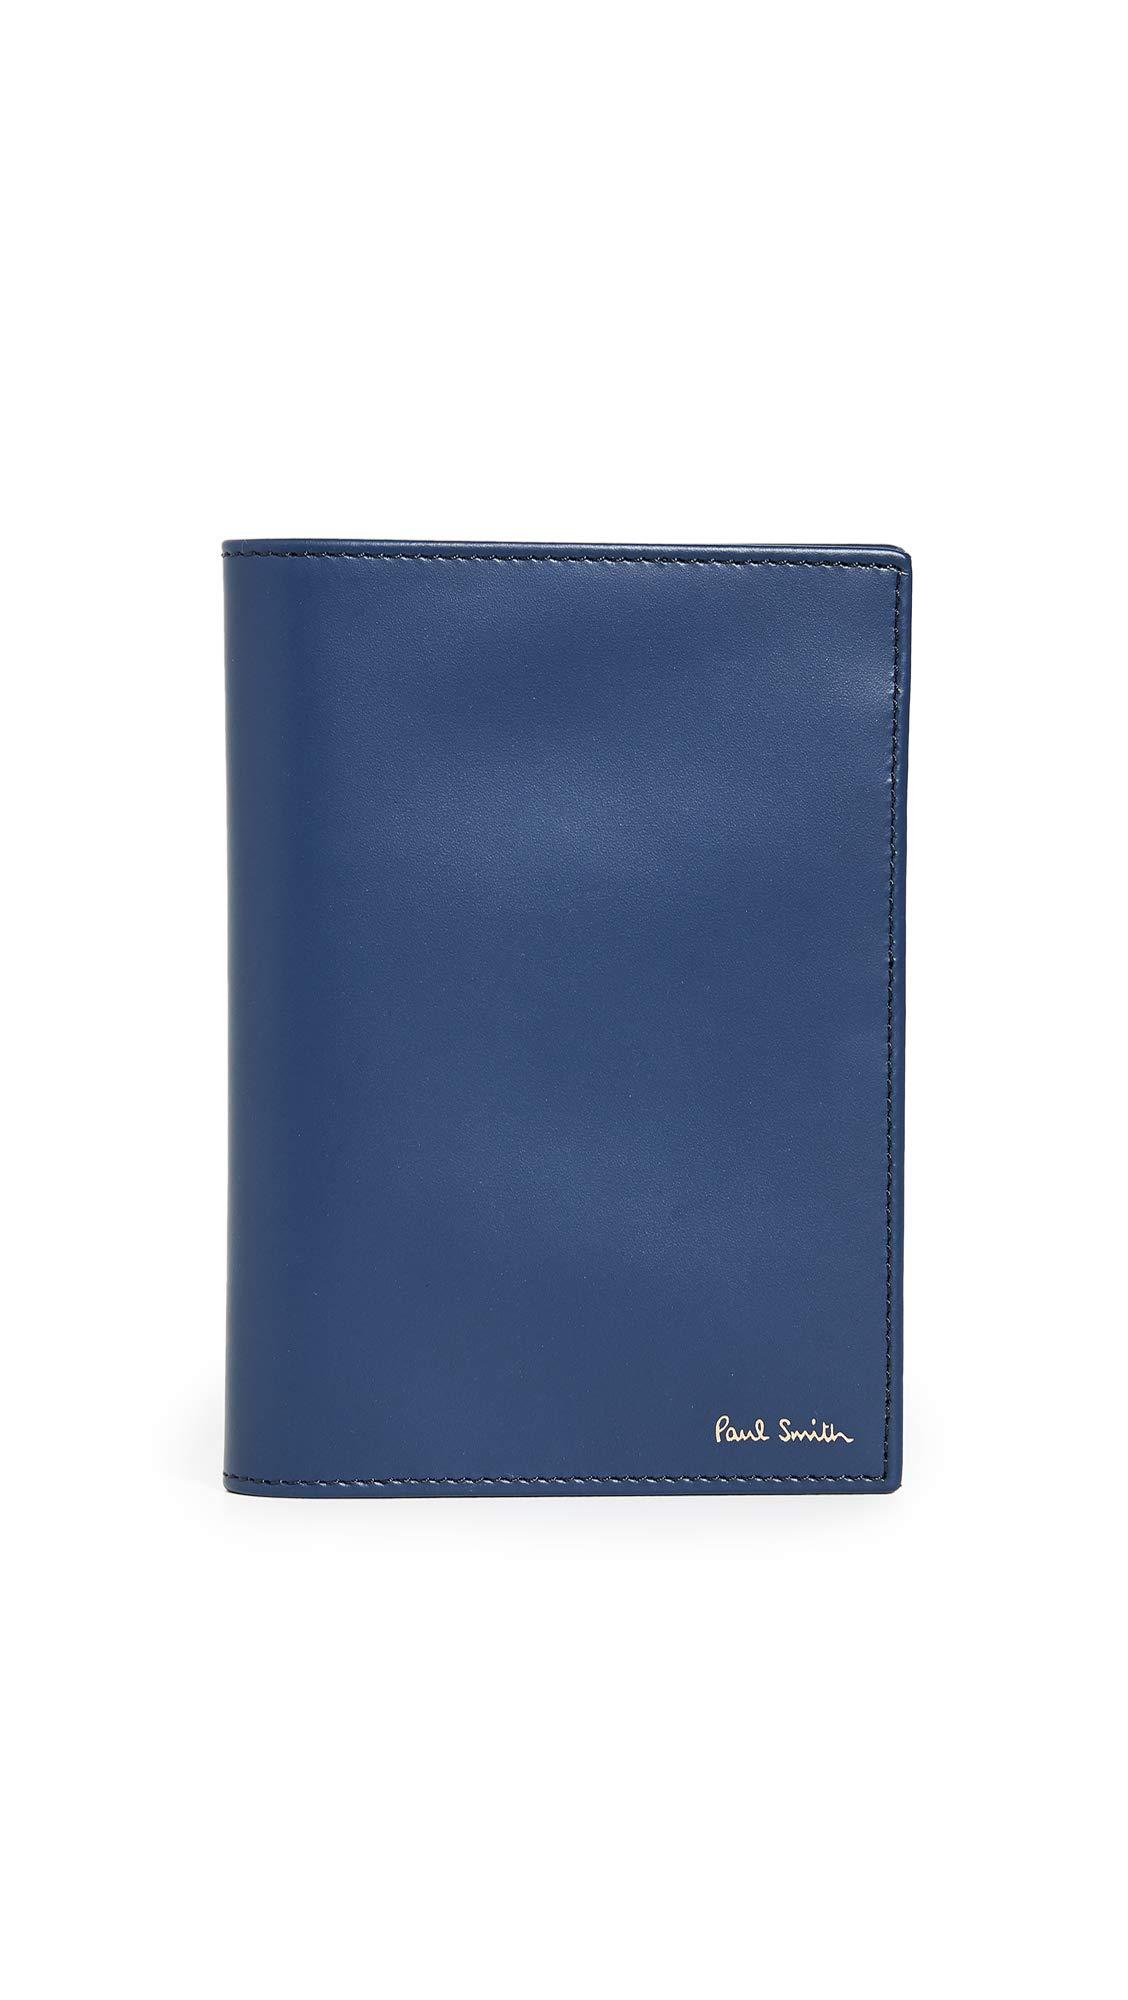 Paul Smith Men's Interior Stripe Passport Holder, Denim, One Size by Paul Smith